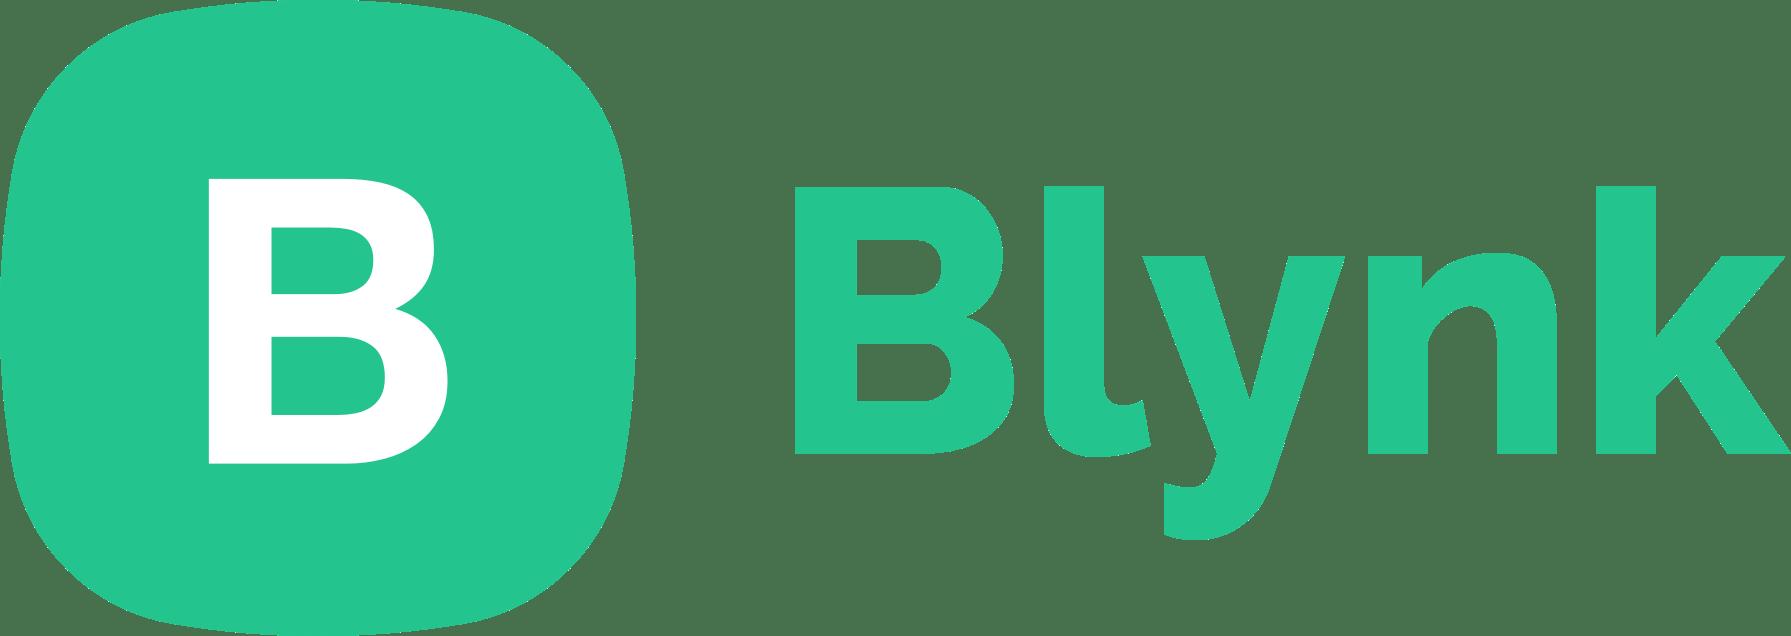 Blynk logo new svawbywyip